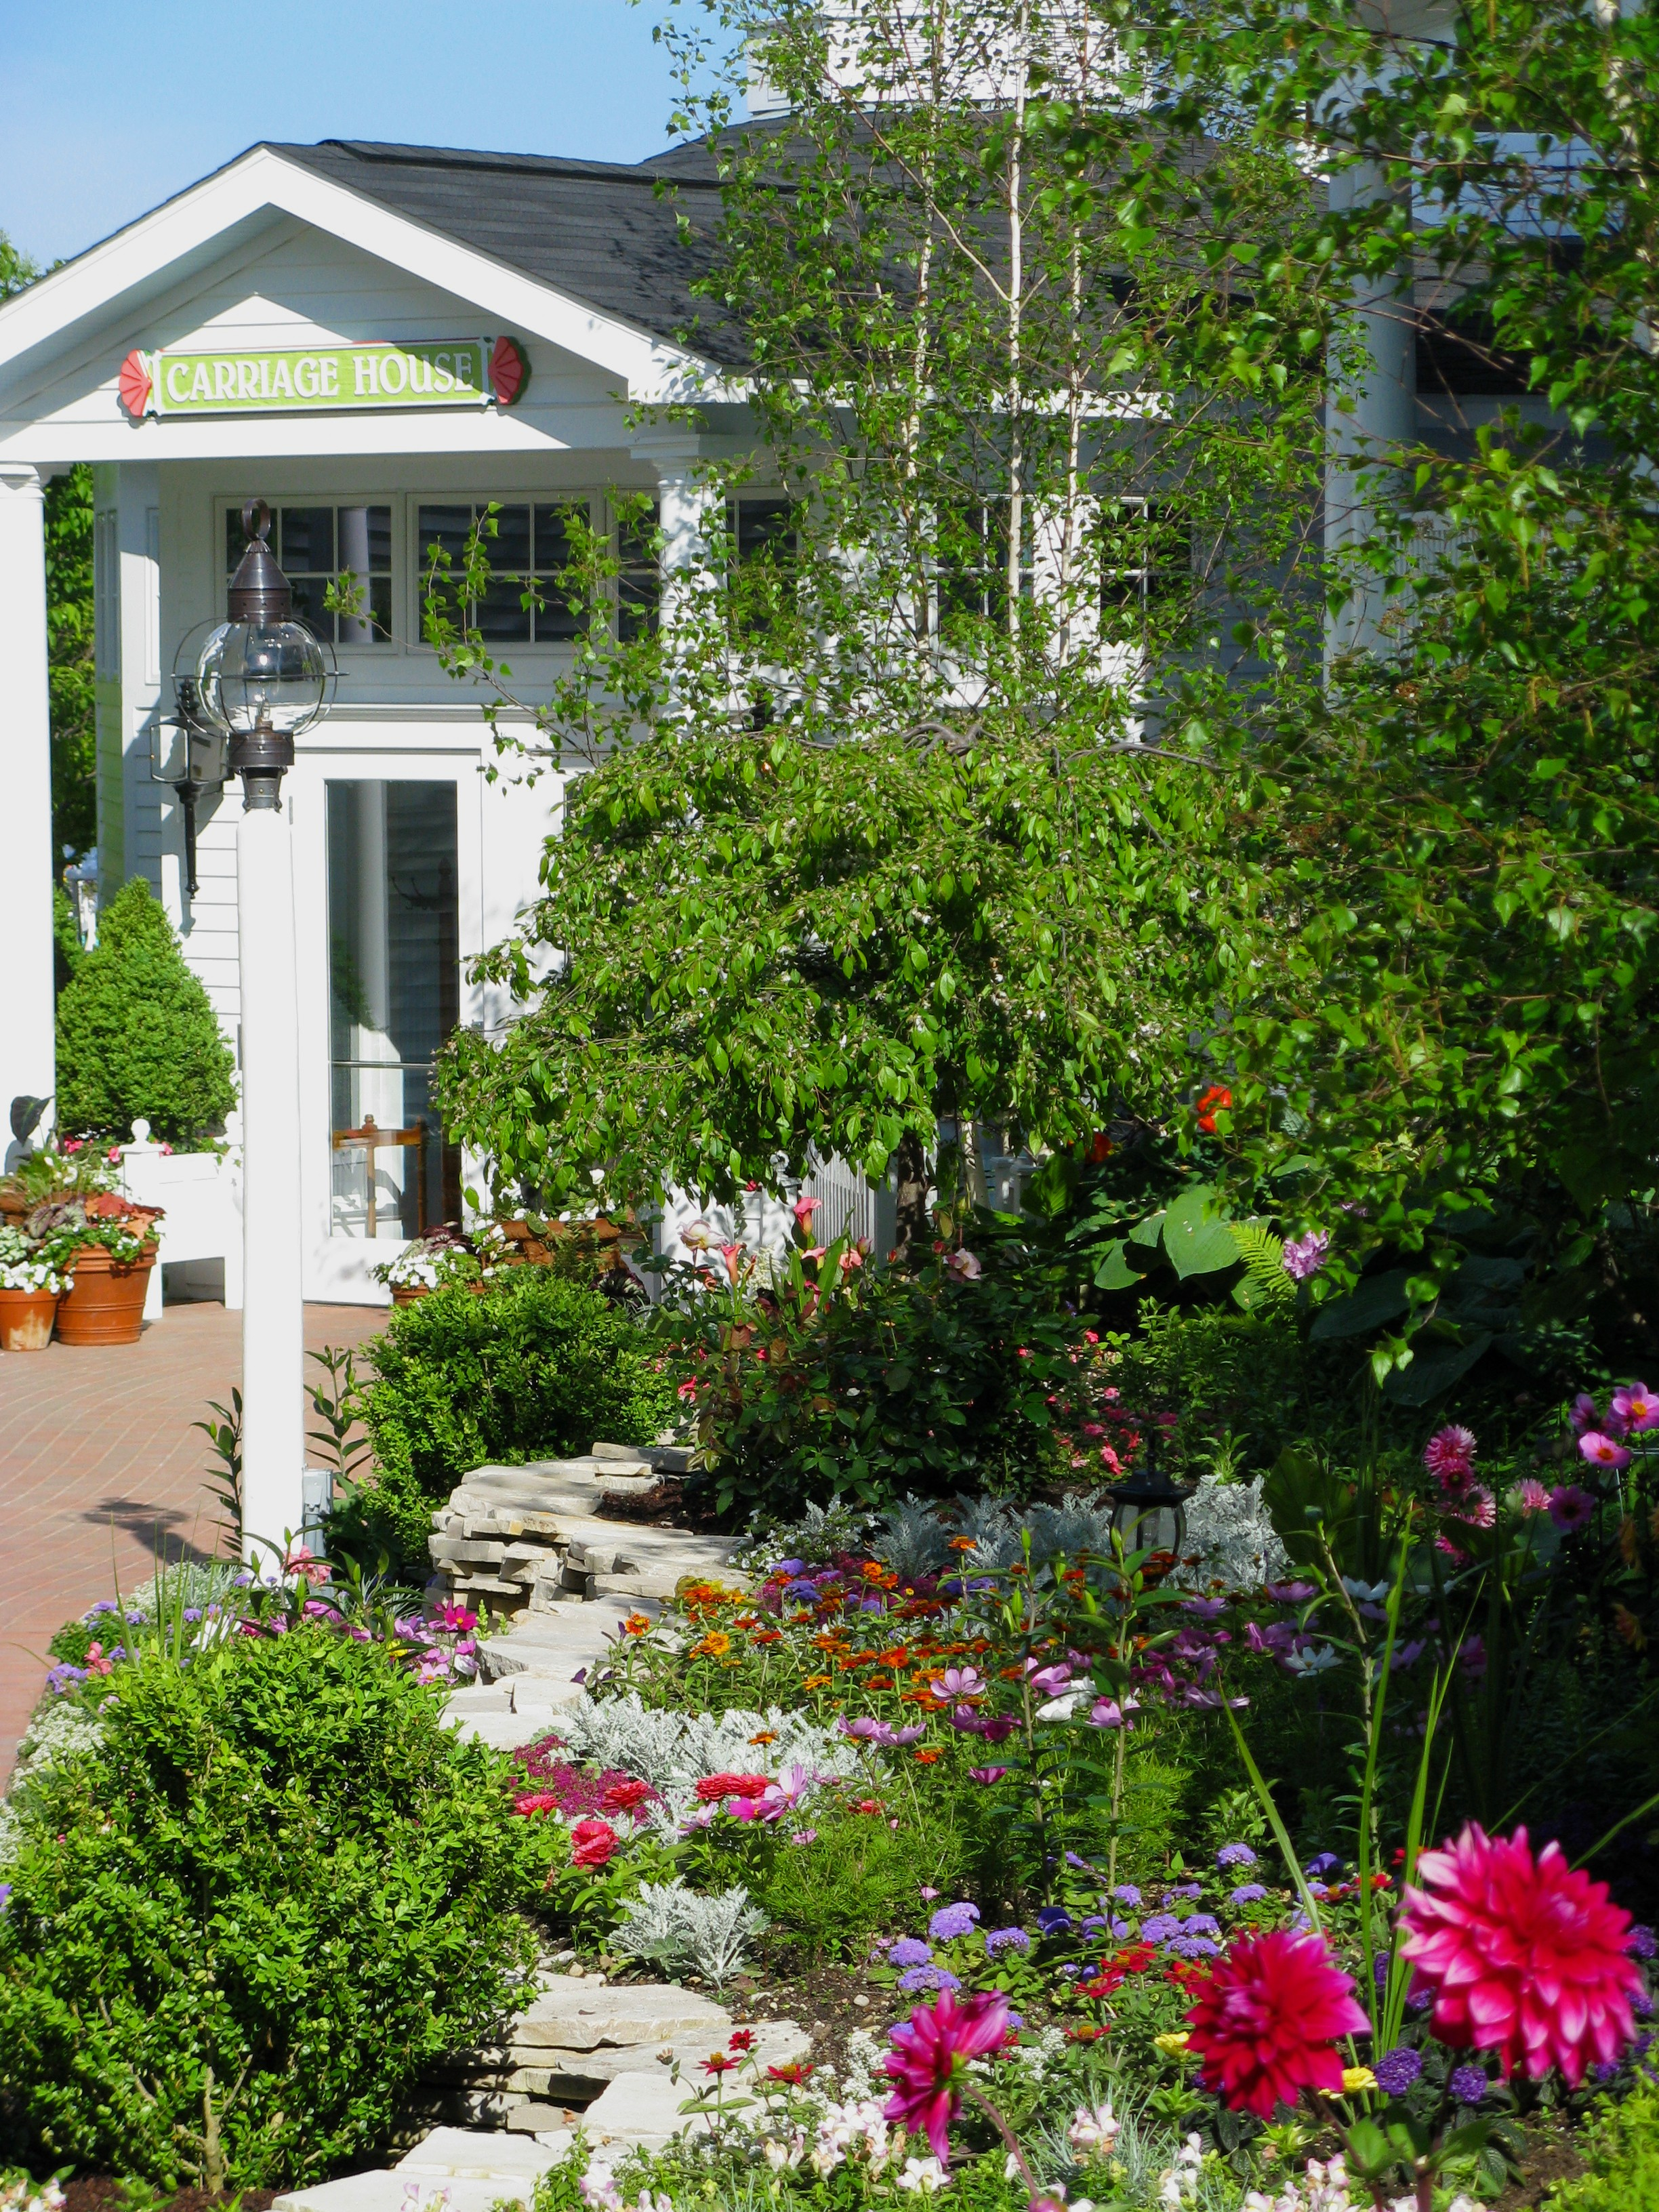 Mackinac Island Carriage House Garden PureMichigan